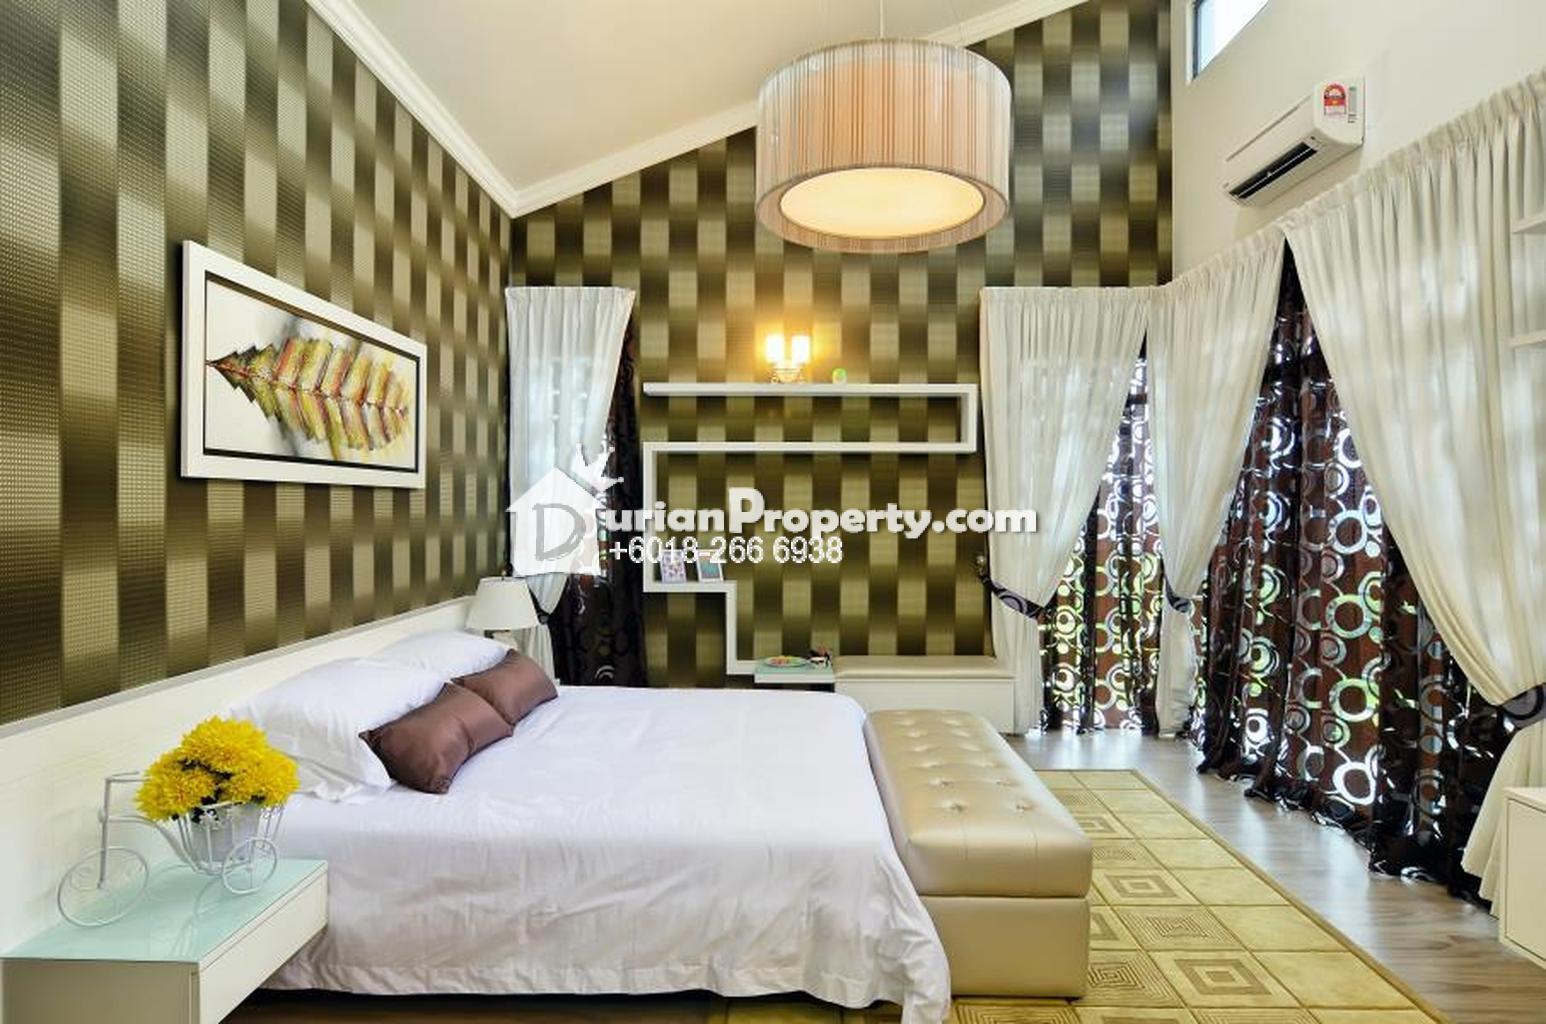 Superlink For Sale at The Hills Residence, Seremban